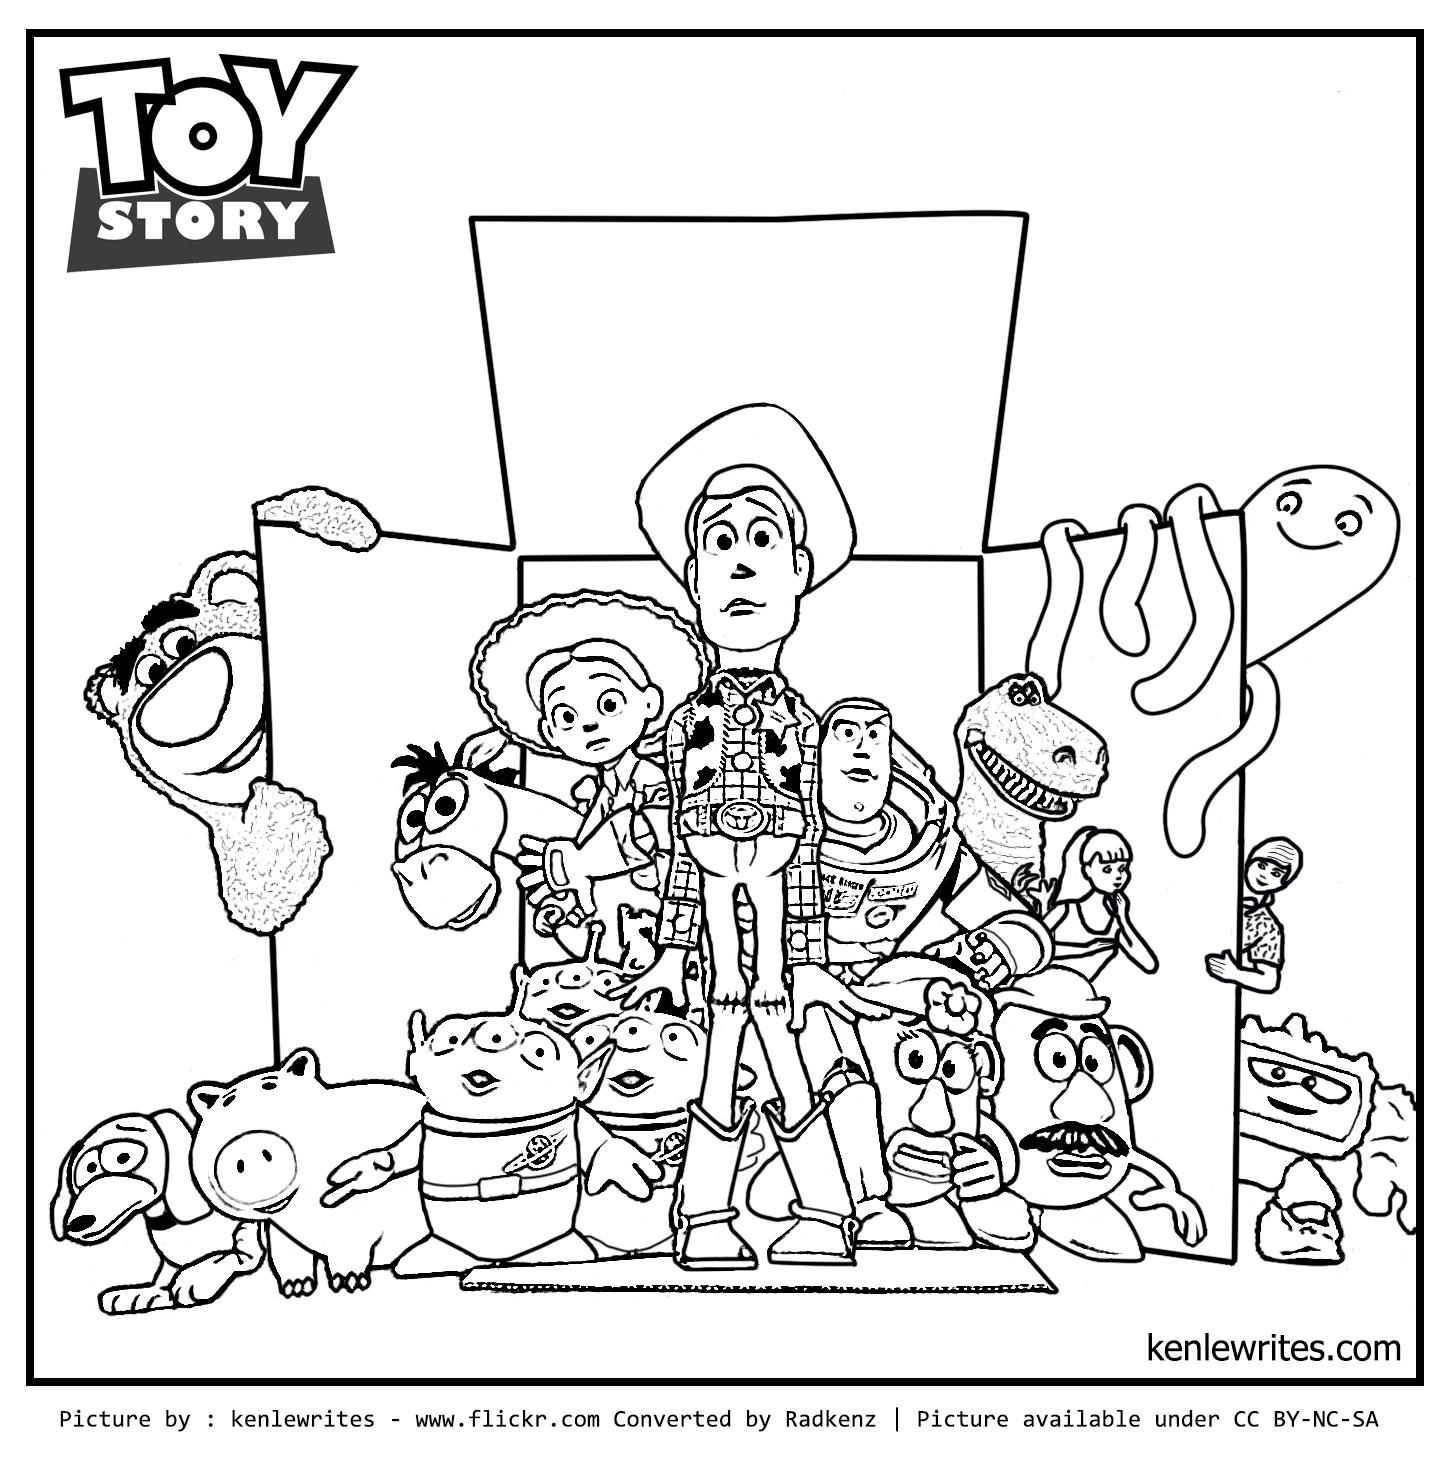 Toy Story 4 Coloring Pages Toy Story Coloring Pages Monster Coloring Pages Cartoon Coloring Pages